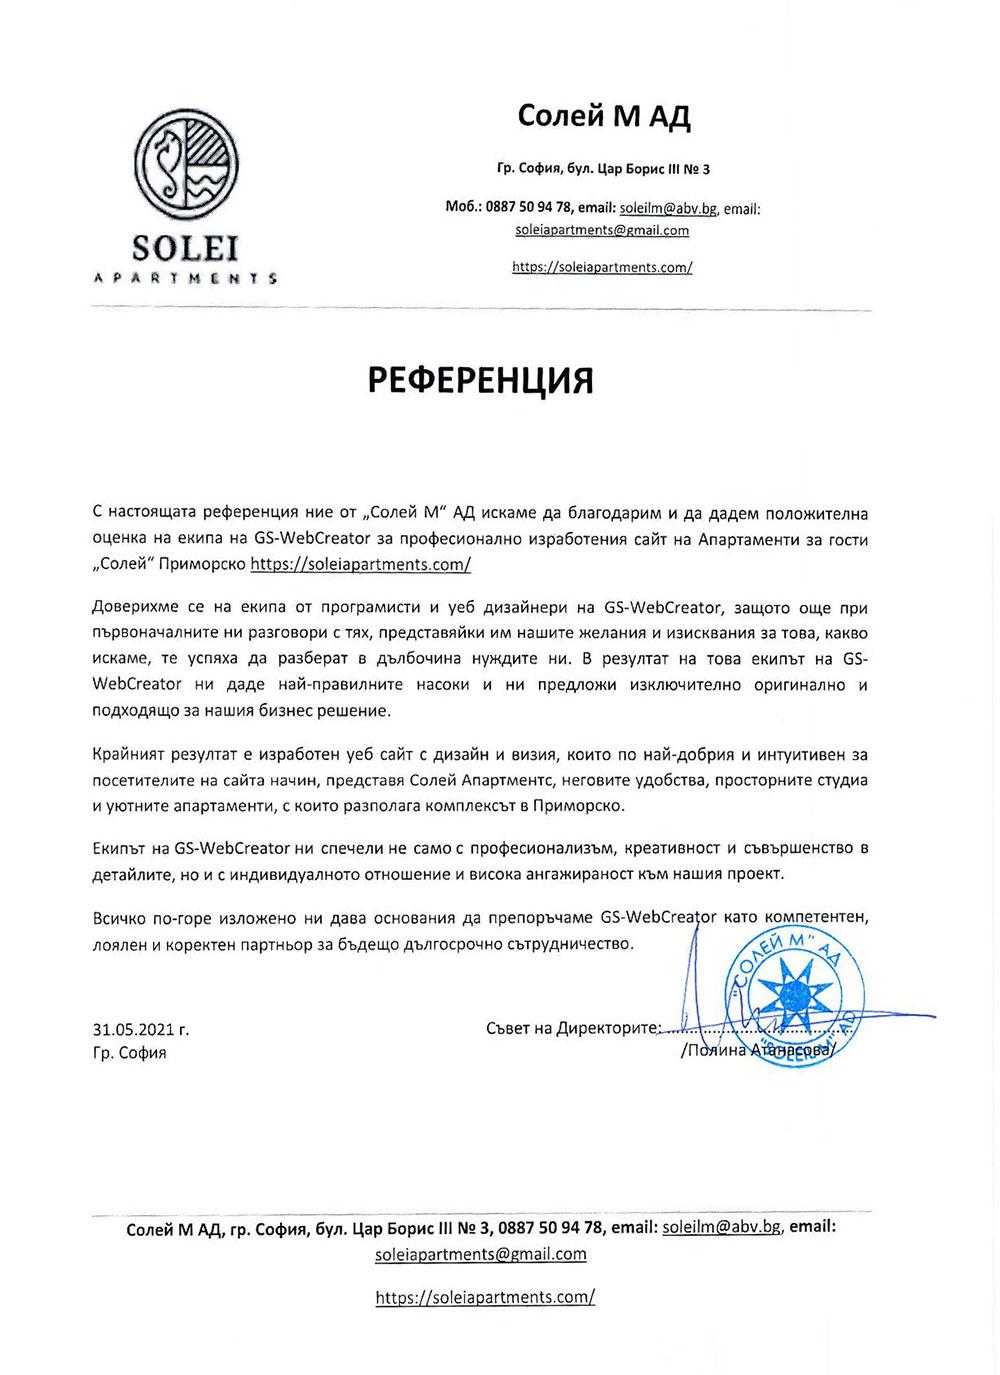 Референция за изработка на сайт на Апартаменти за гости Солей Приморско, издадена на GS-WebCreator